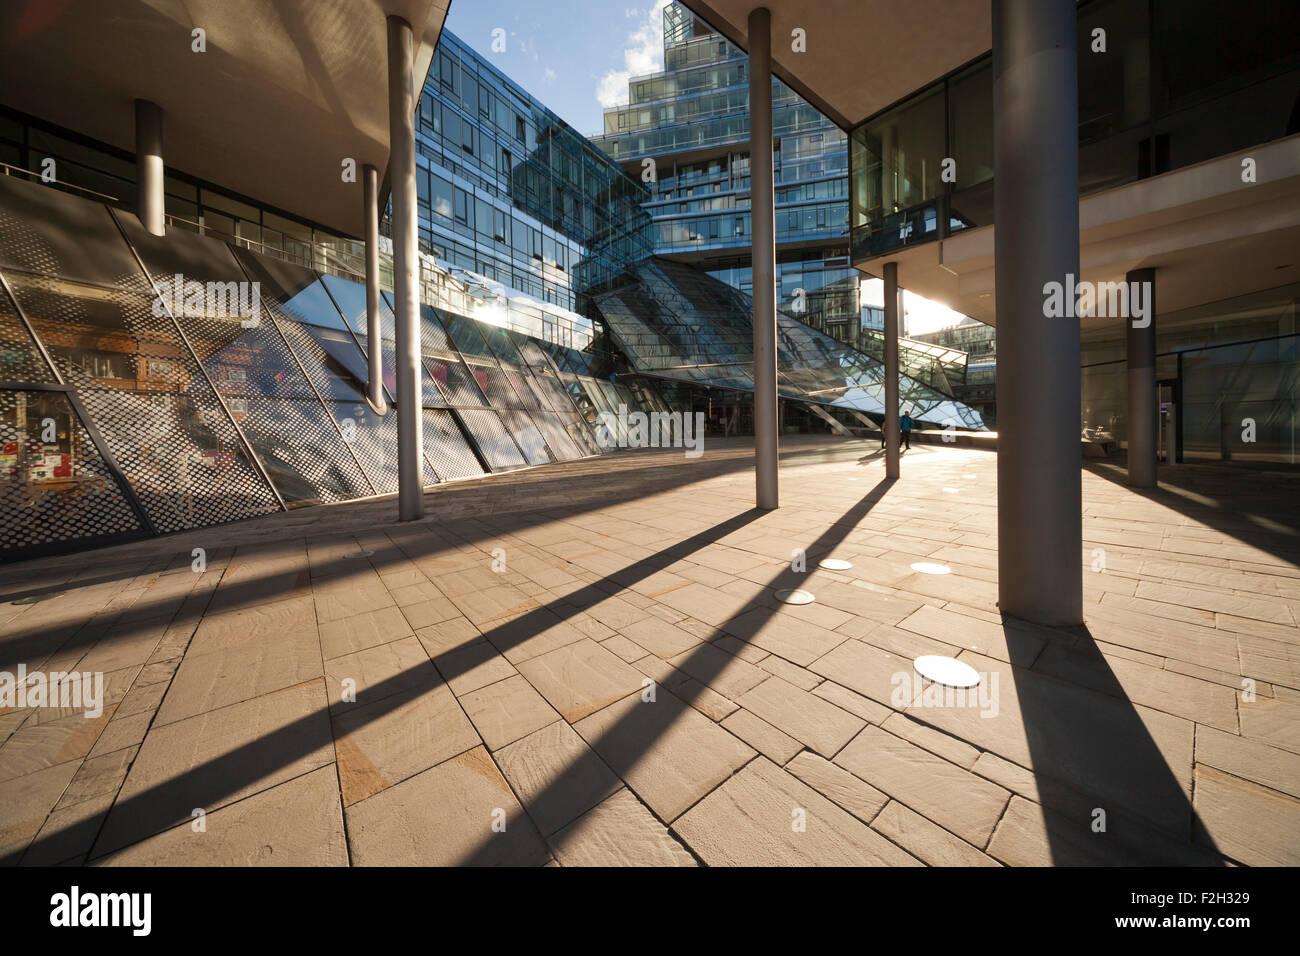 Bank NORD/LB modern head office designed by Behnisch Architekten in Hanover, Lower Saxony, Germany - Stock Image